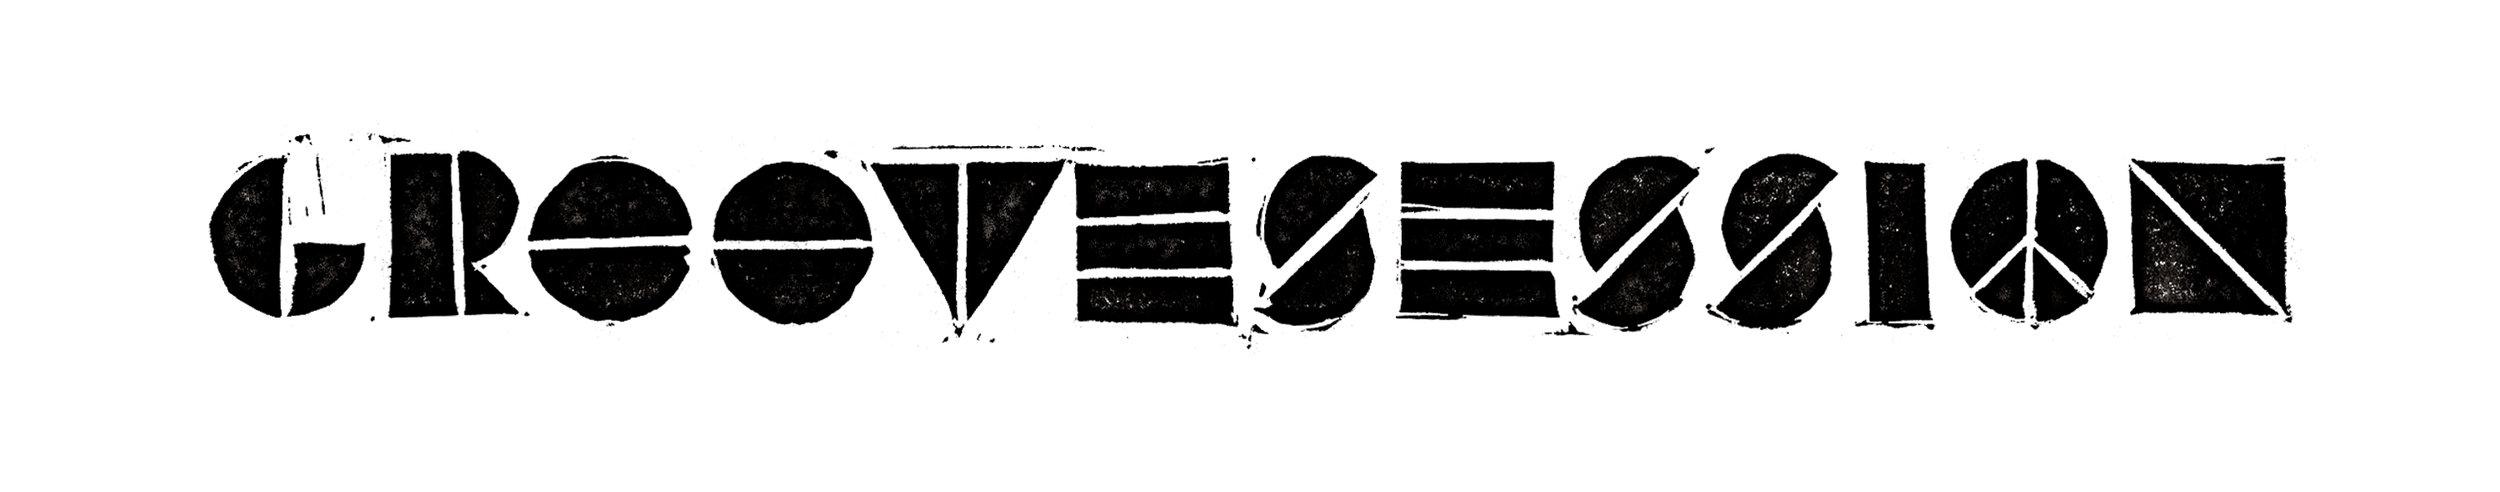 gs_logo_long_bw.jpg